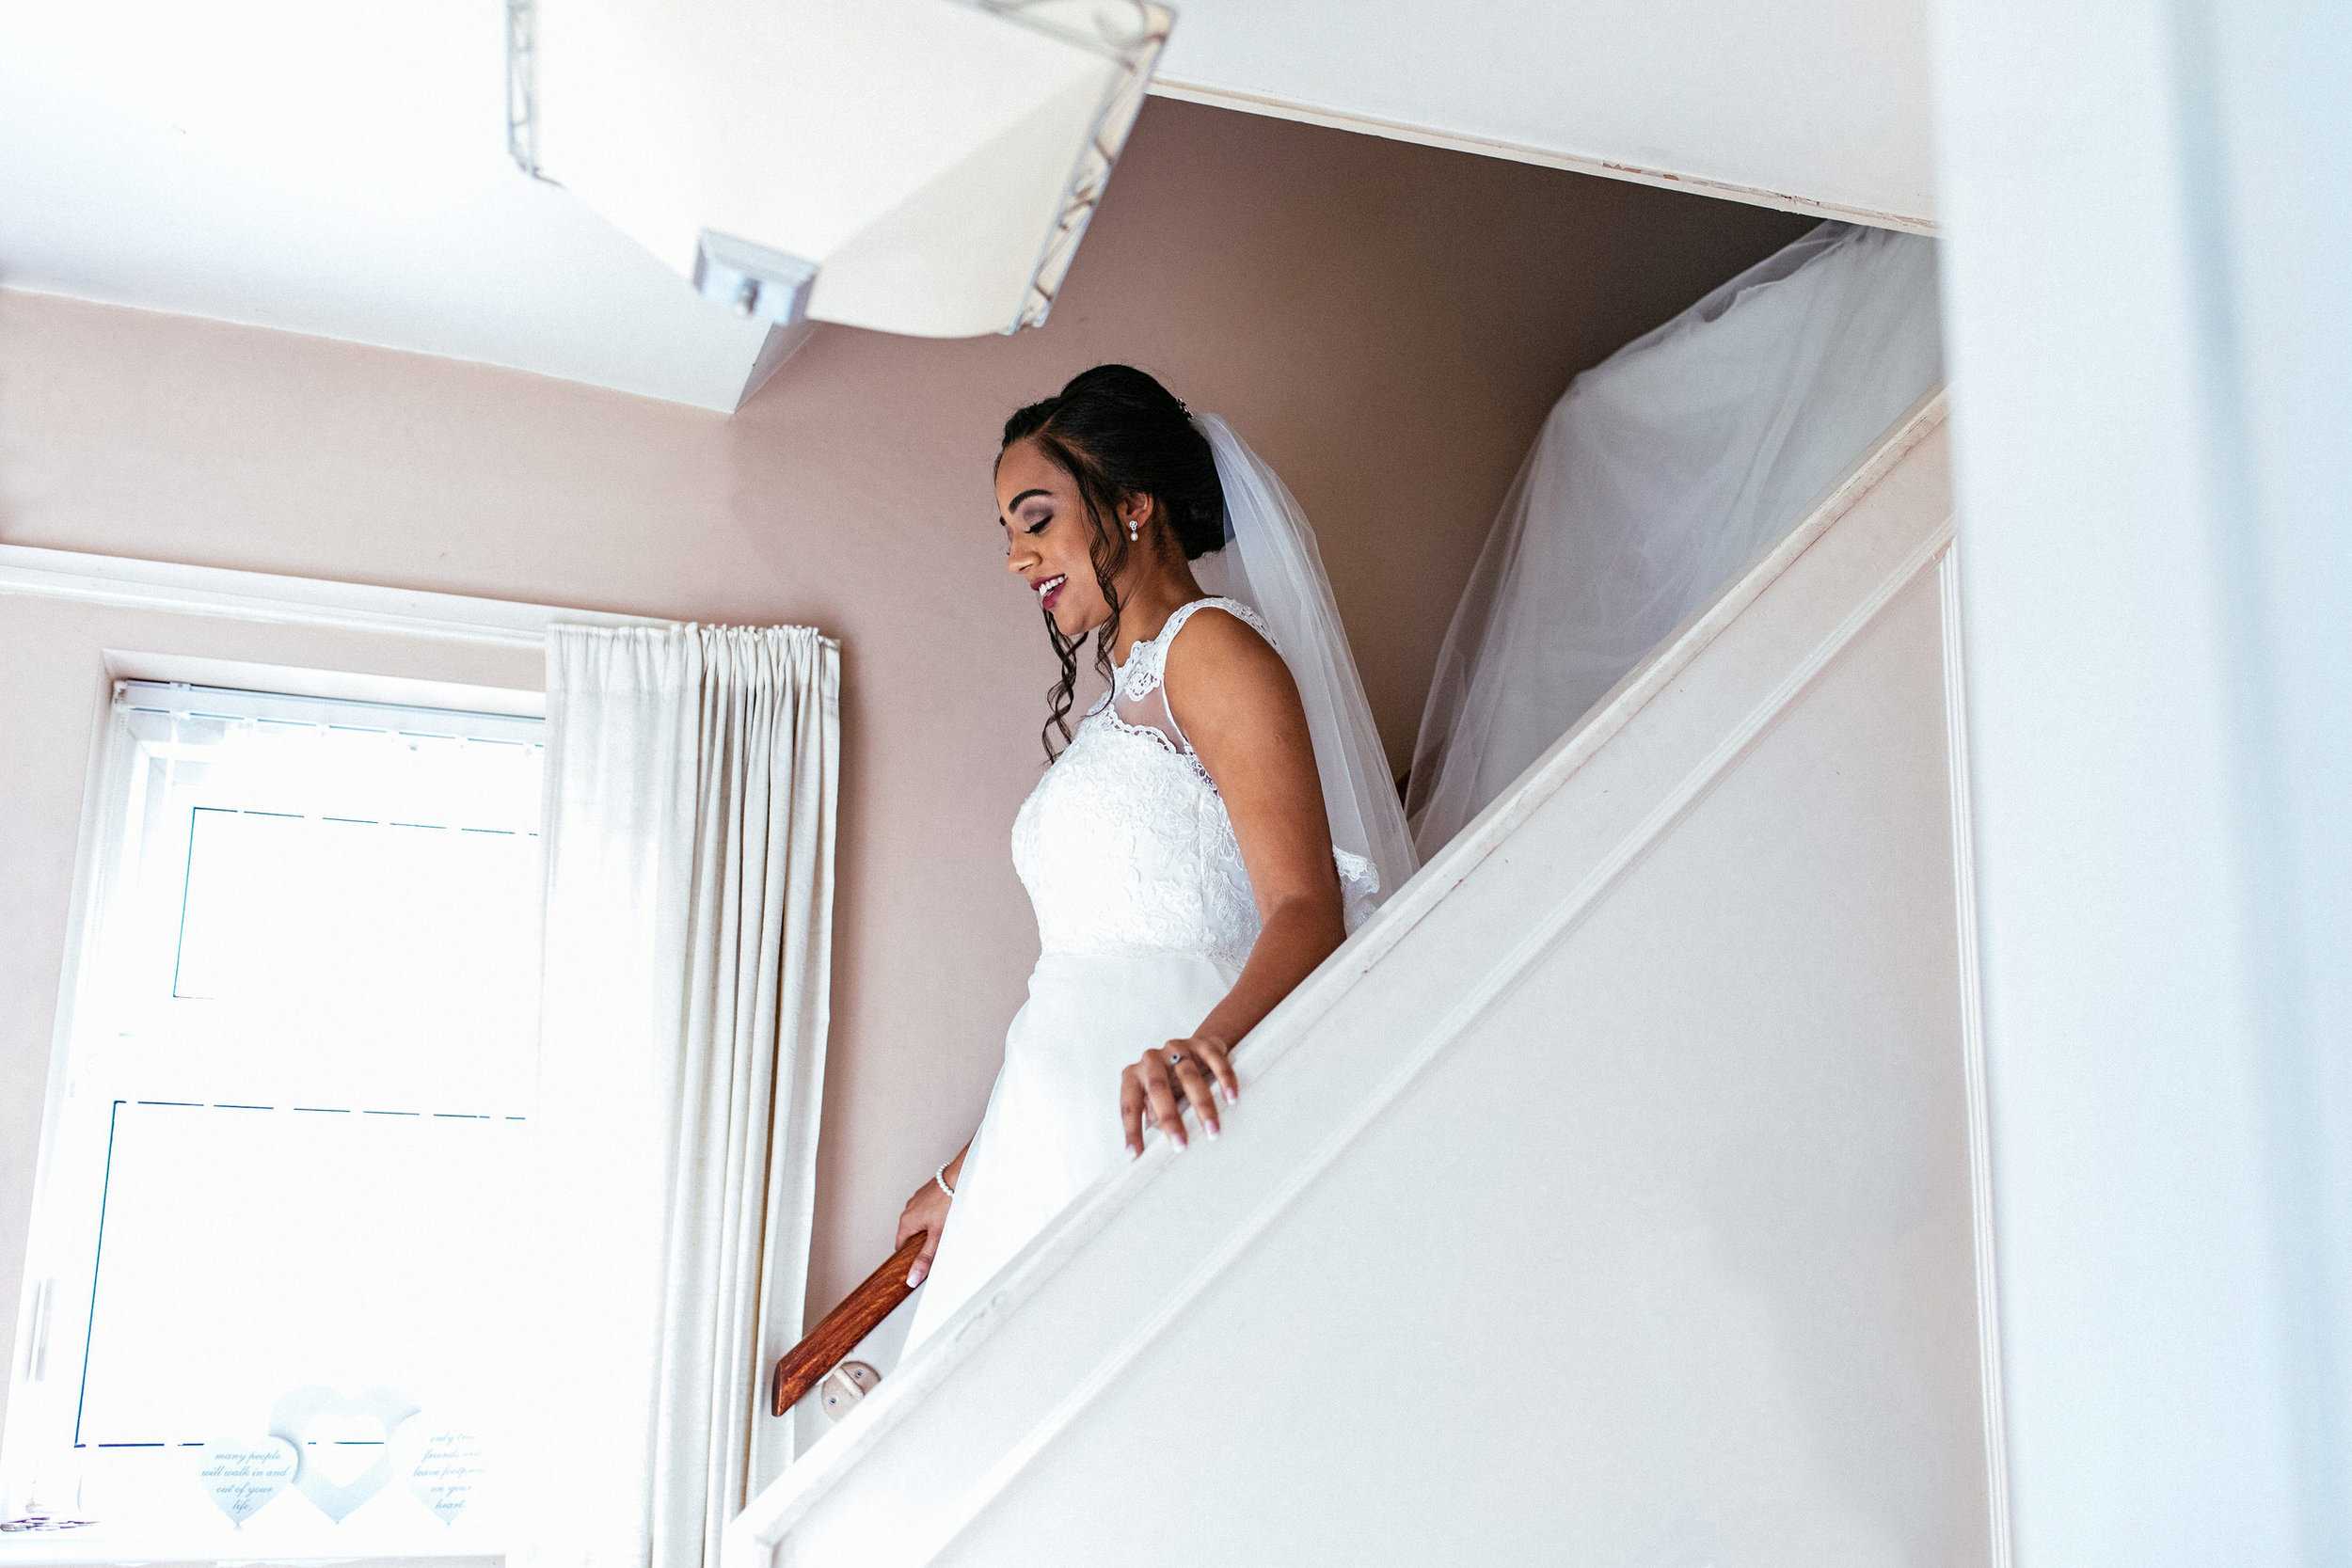 The-Bond-Company-Wedding-Photography-11-1.jpg